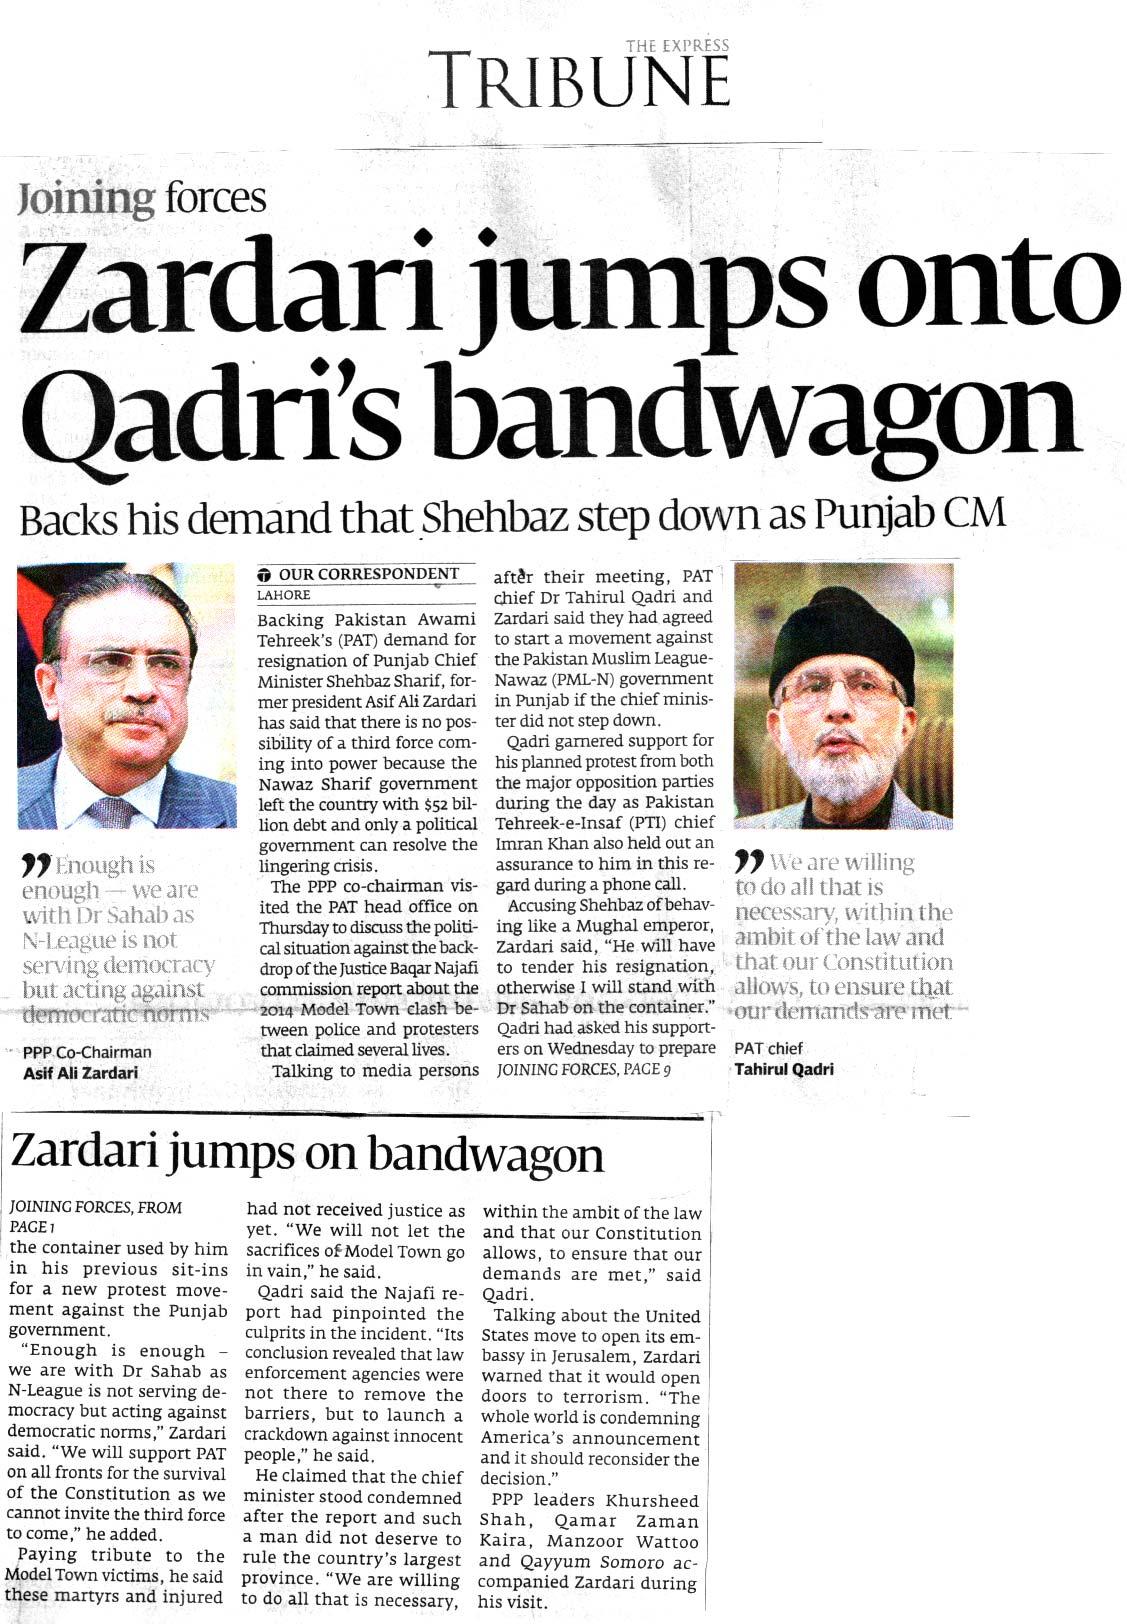 Pakistan Awami Tehreek  Print Media Coverage DAILY EXPRESS TRIBUNE FRONT PAGE